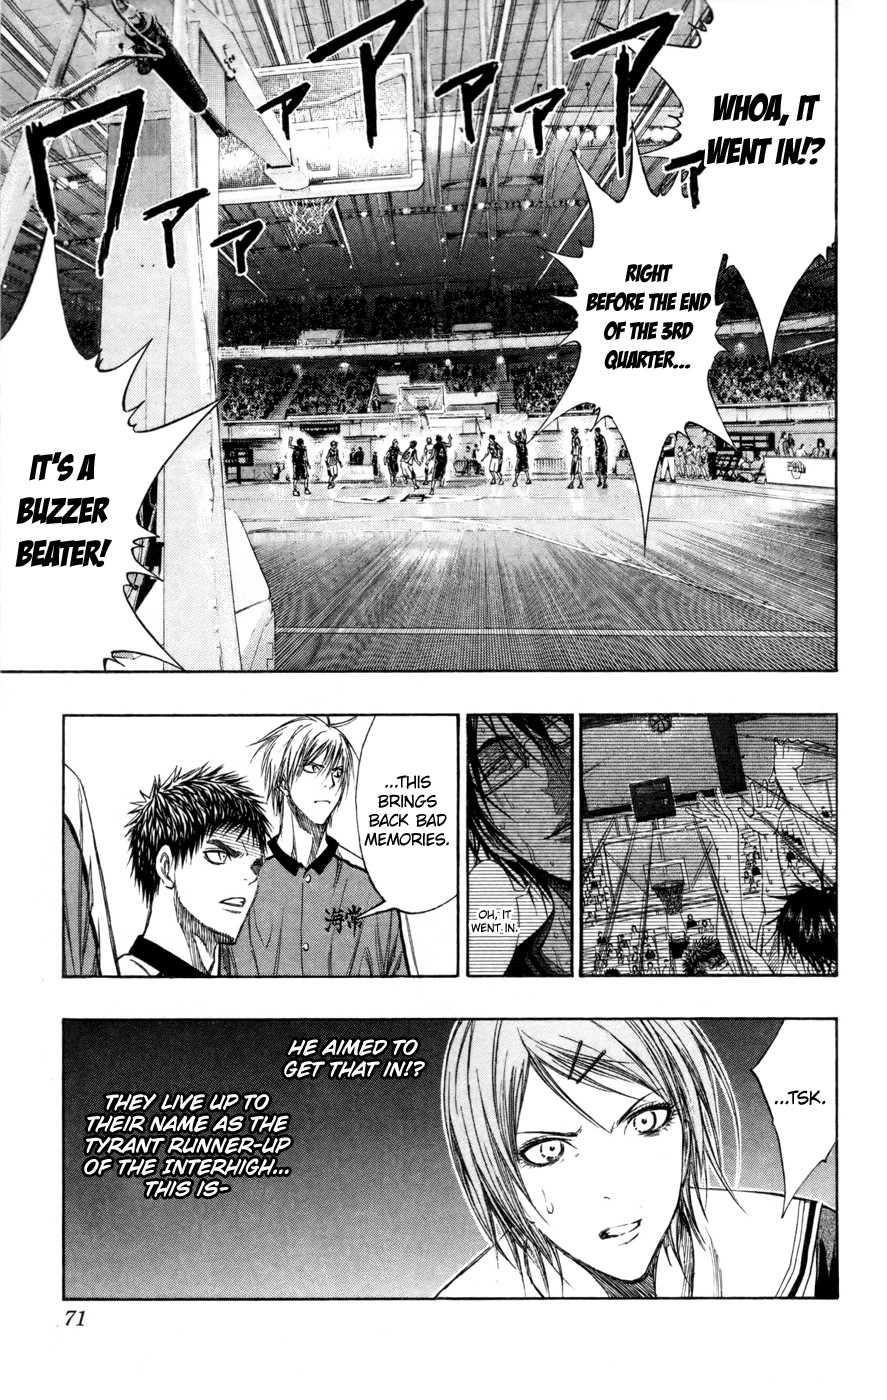 Kuroko no Basket Manga Chapter 130 - Image 05